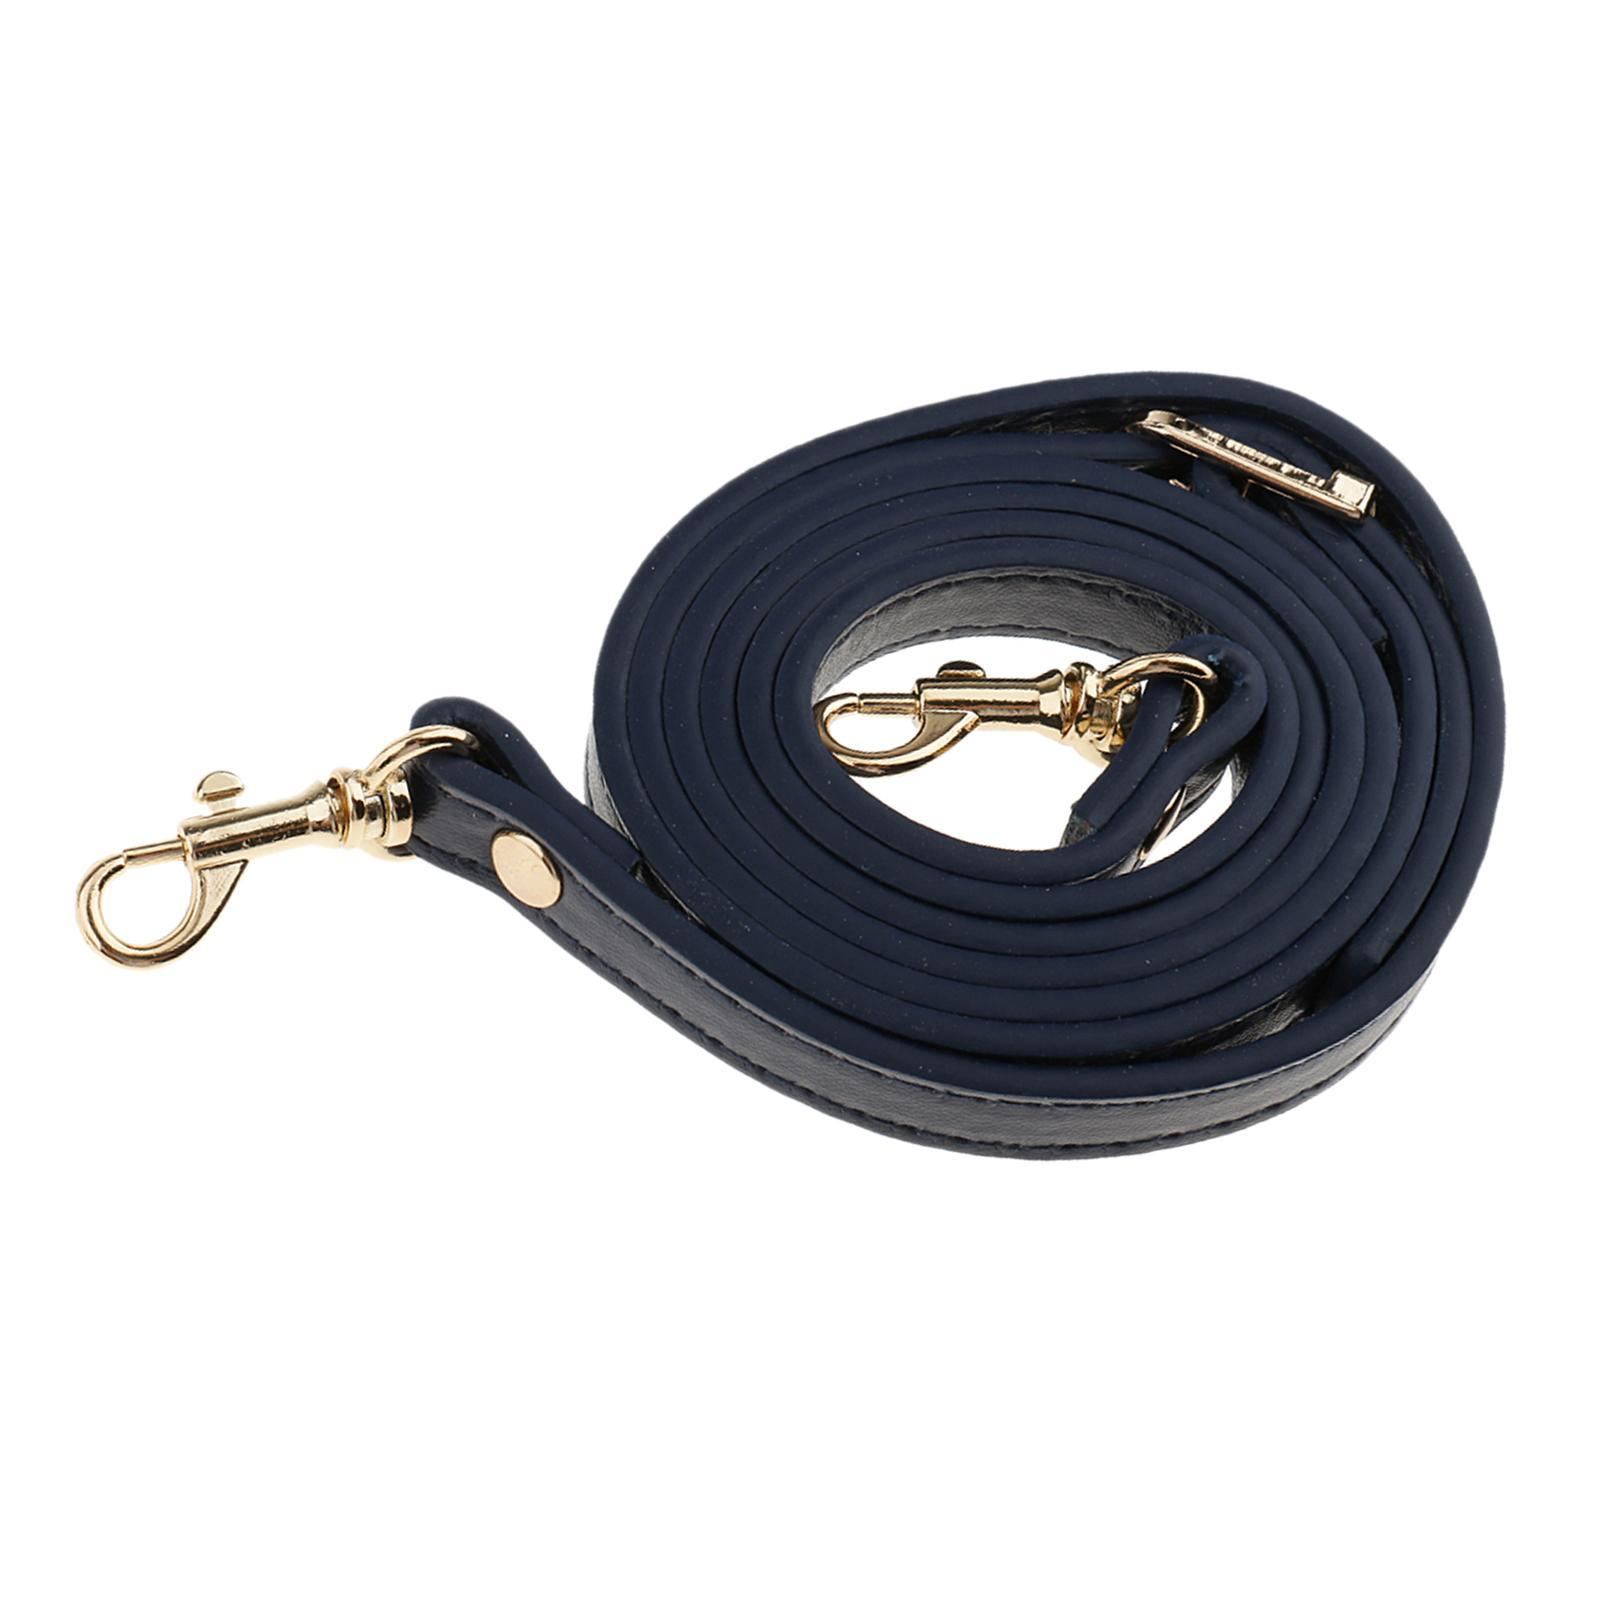 120cm-Bag-Leather-Strap-Replacement-Shoulder-Bags-Handle-Crossbody-Strap thumbnail 22